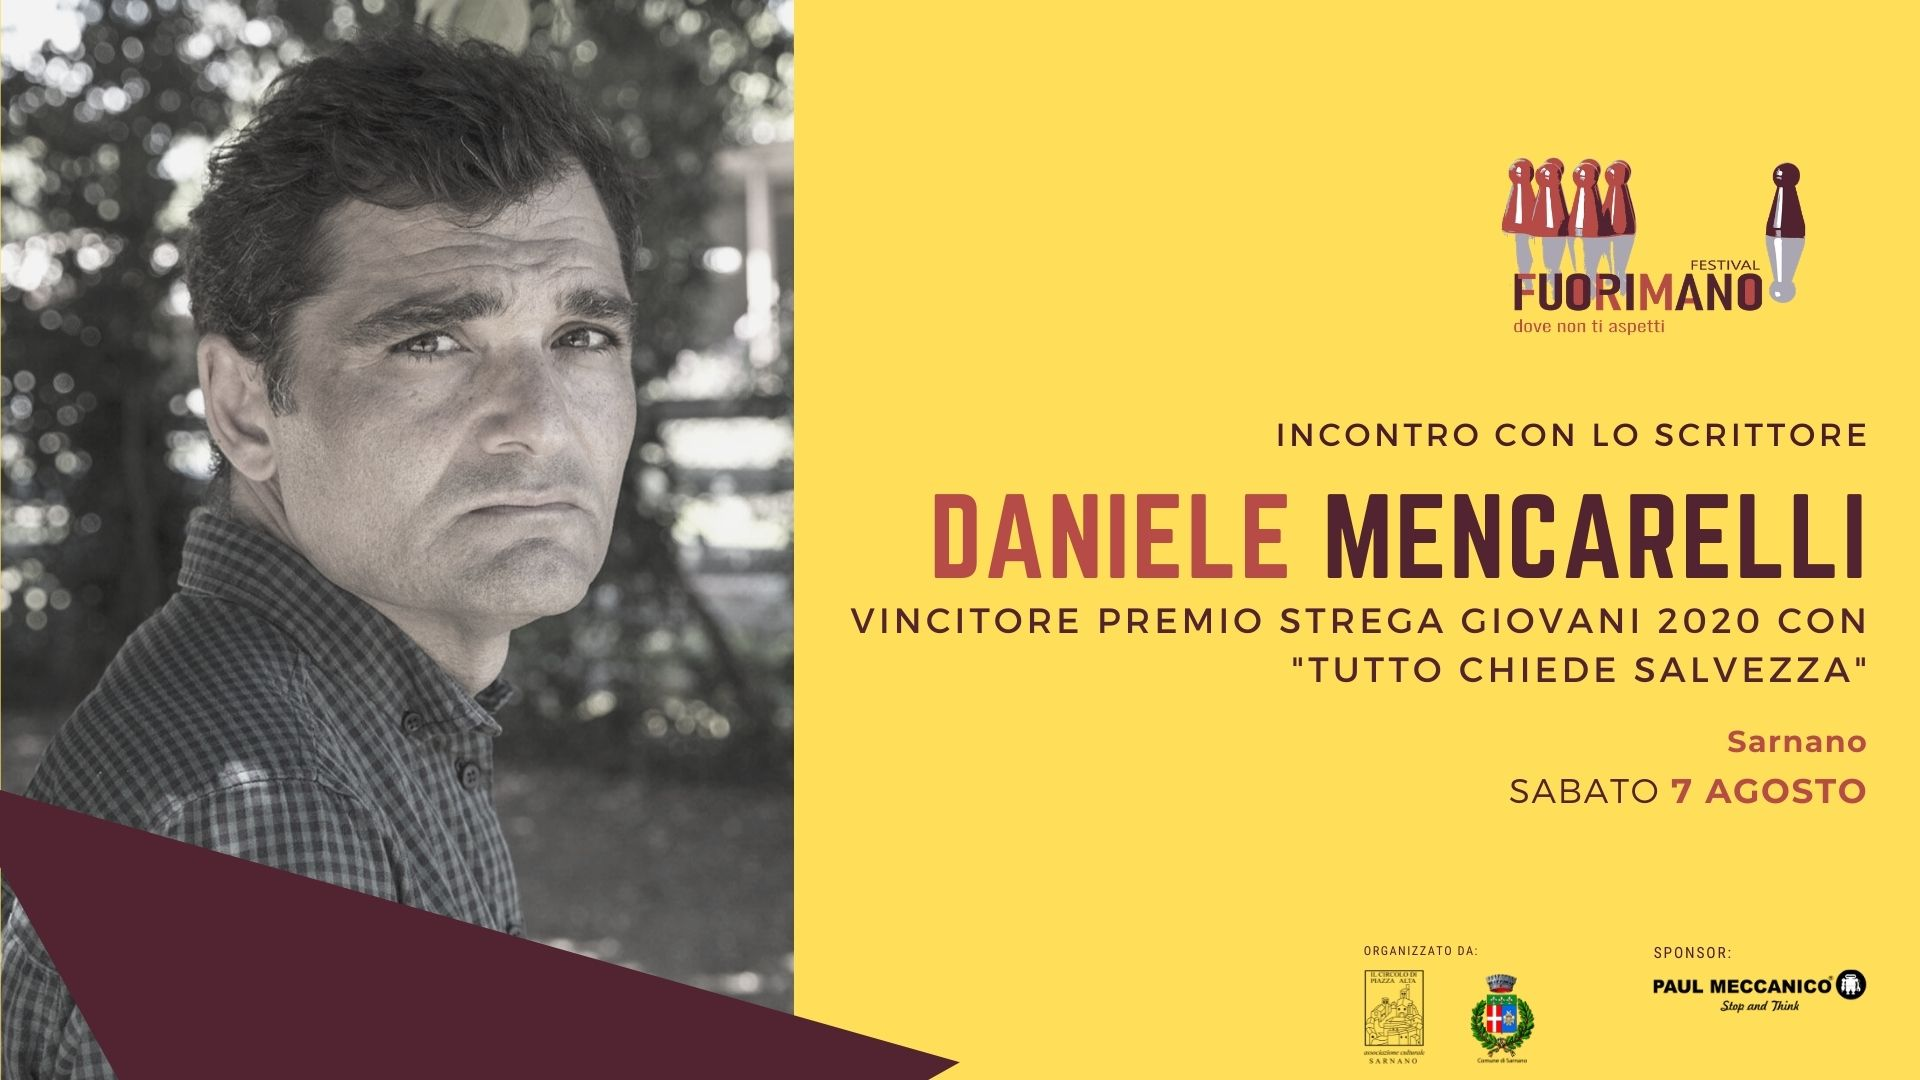 Daniele Mencarelli - FuoriMano Sarnano